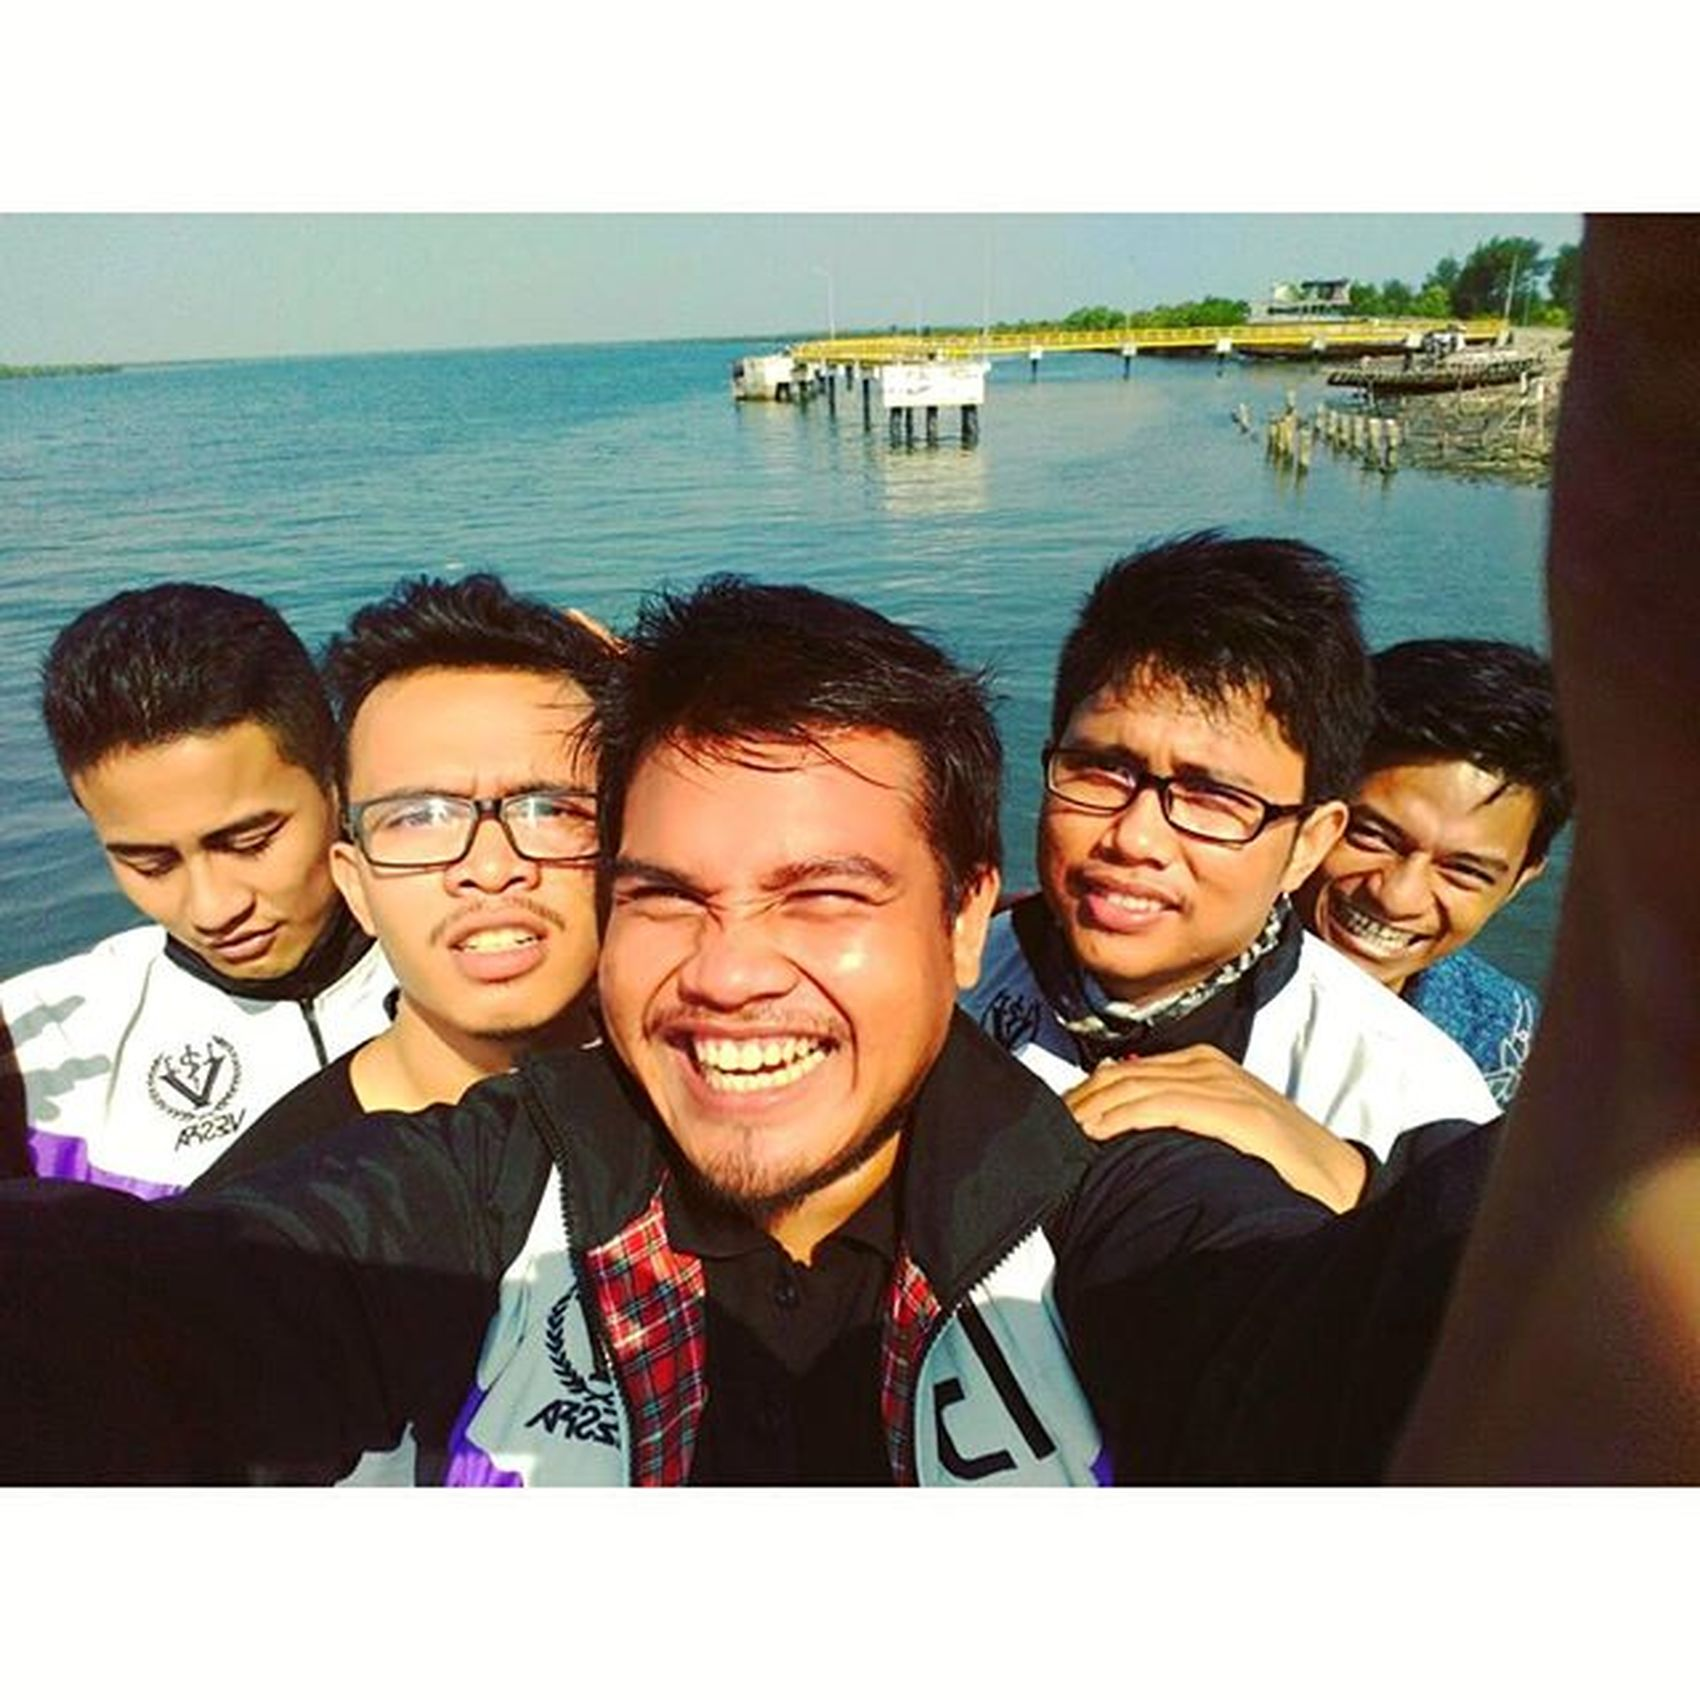 Selamat pagi Salam dari kuala langsa @kotabandaaceh @vscoaceh @kameraaceh @photoaceh @remajaaceh @keunebahaceh @wisataaceh Aceh Acehkece Acehphotoclub Visitaceh Remajaaceh Kotabandaaceh Kotalangsa Mtmpijay Camera Asianstyle Beach Tagforlike .com Liker Instagram Instagramers